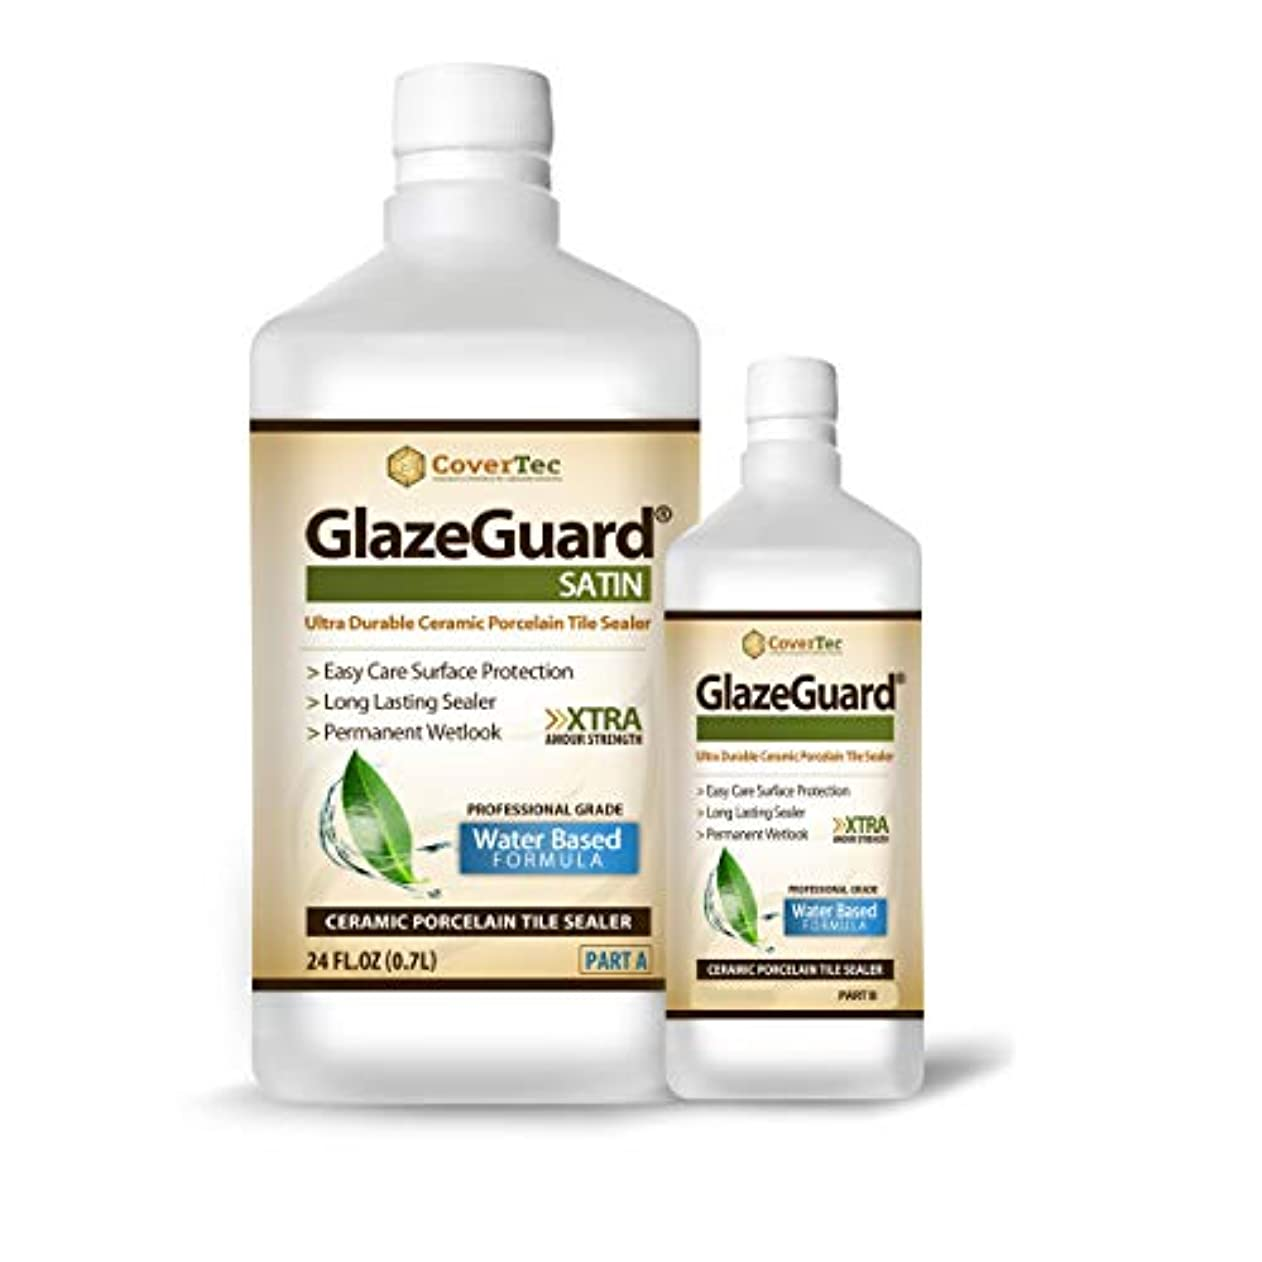 OKSLO Glazeguard satin sealer for ceramic, porcelain, stone tile floor/wall surfaces pyqyzysubms21730